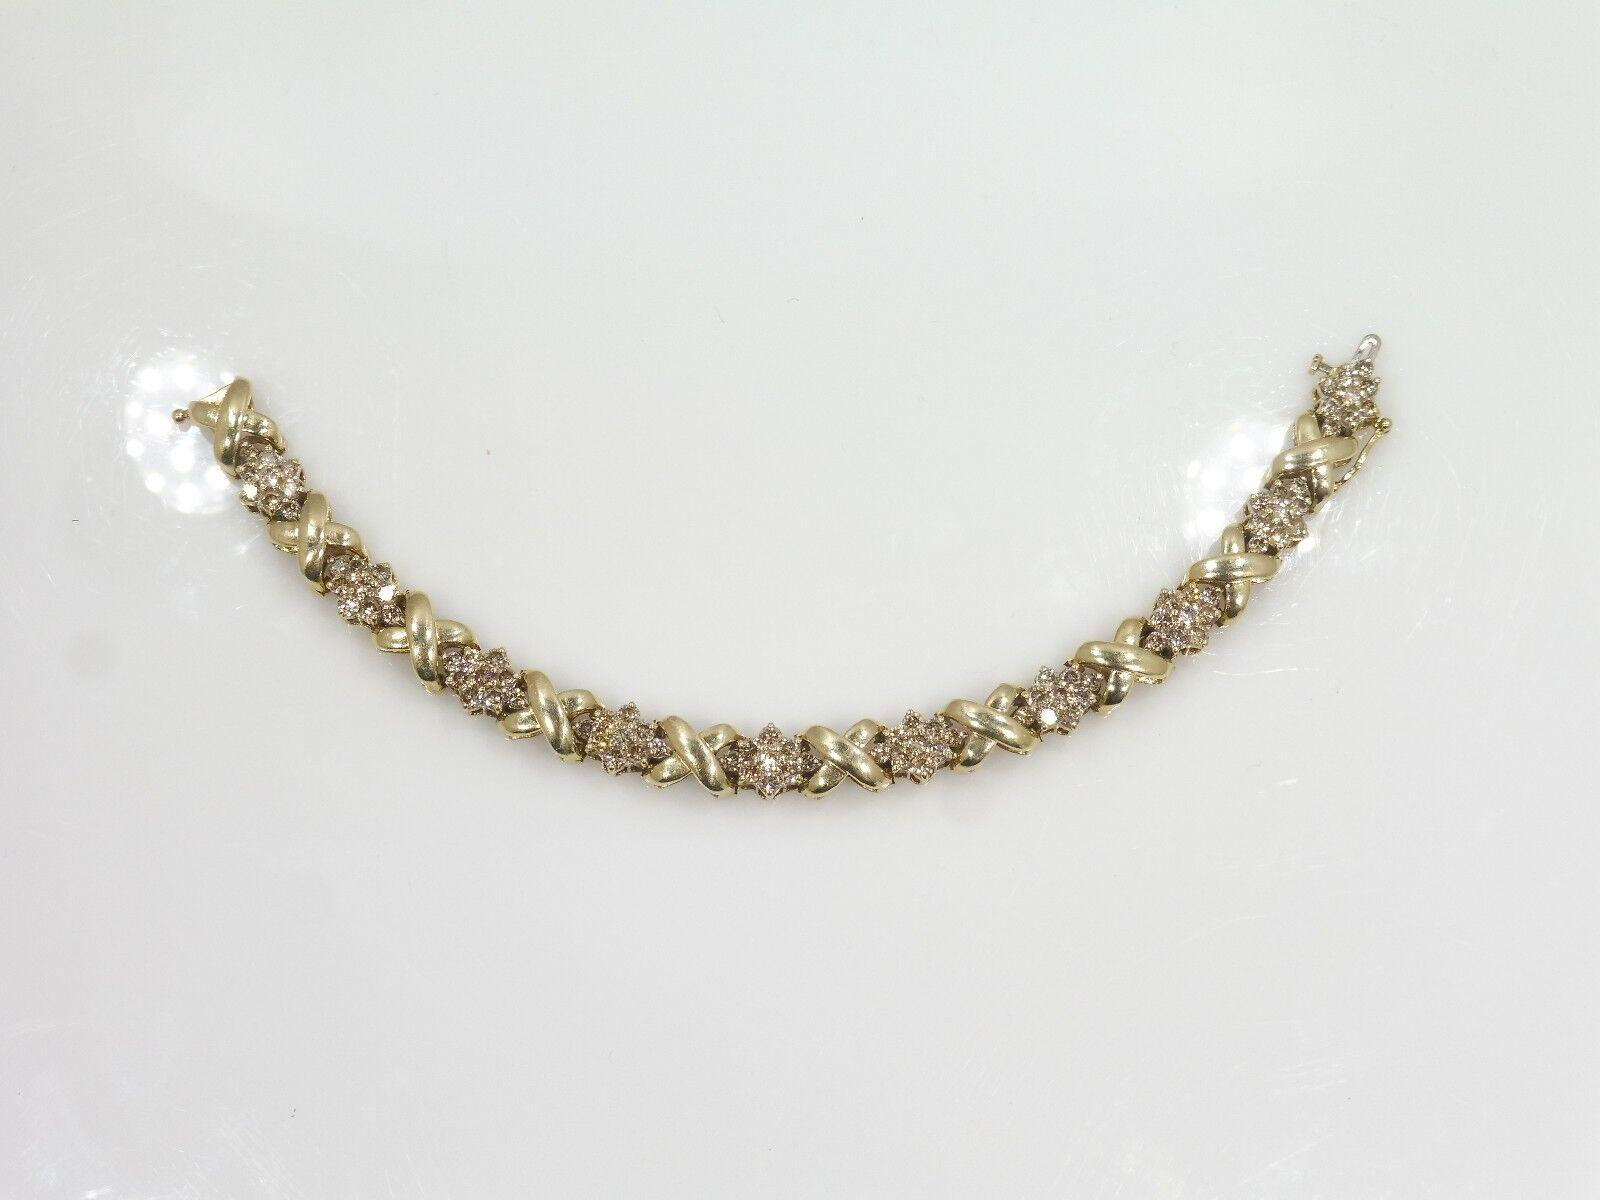 14K YELLOW gold XO 5 CARAT DIAMOND TENNIS BRACELET .92 TROY OZ